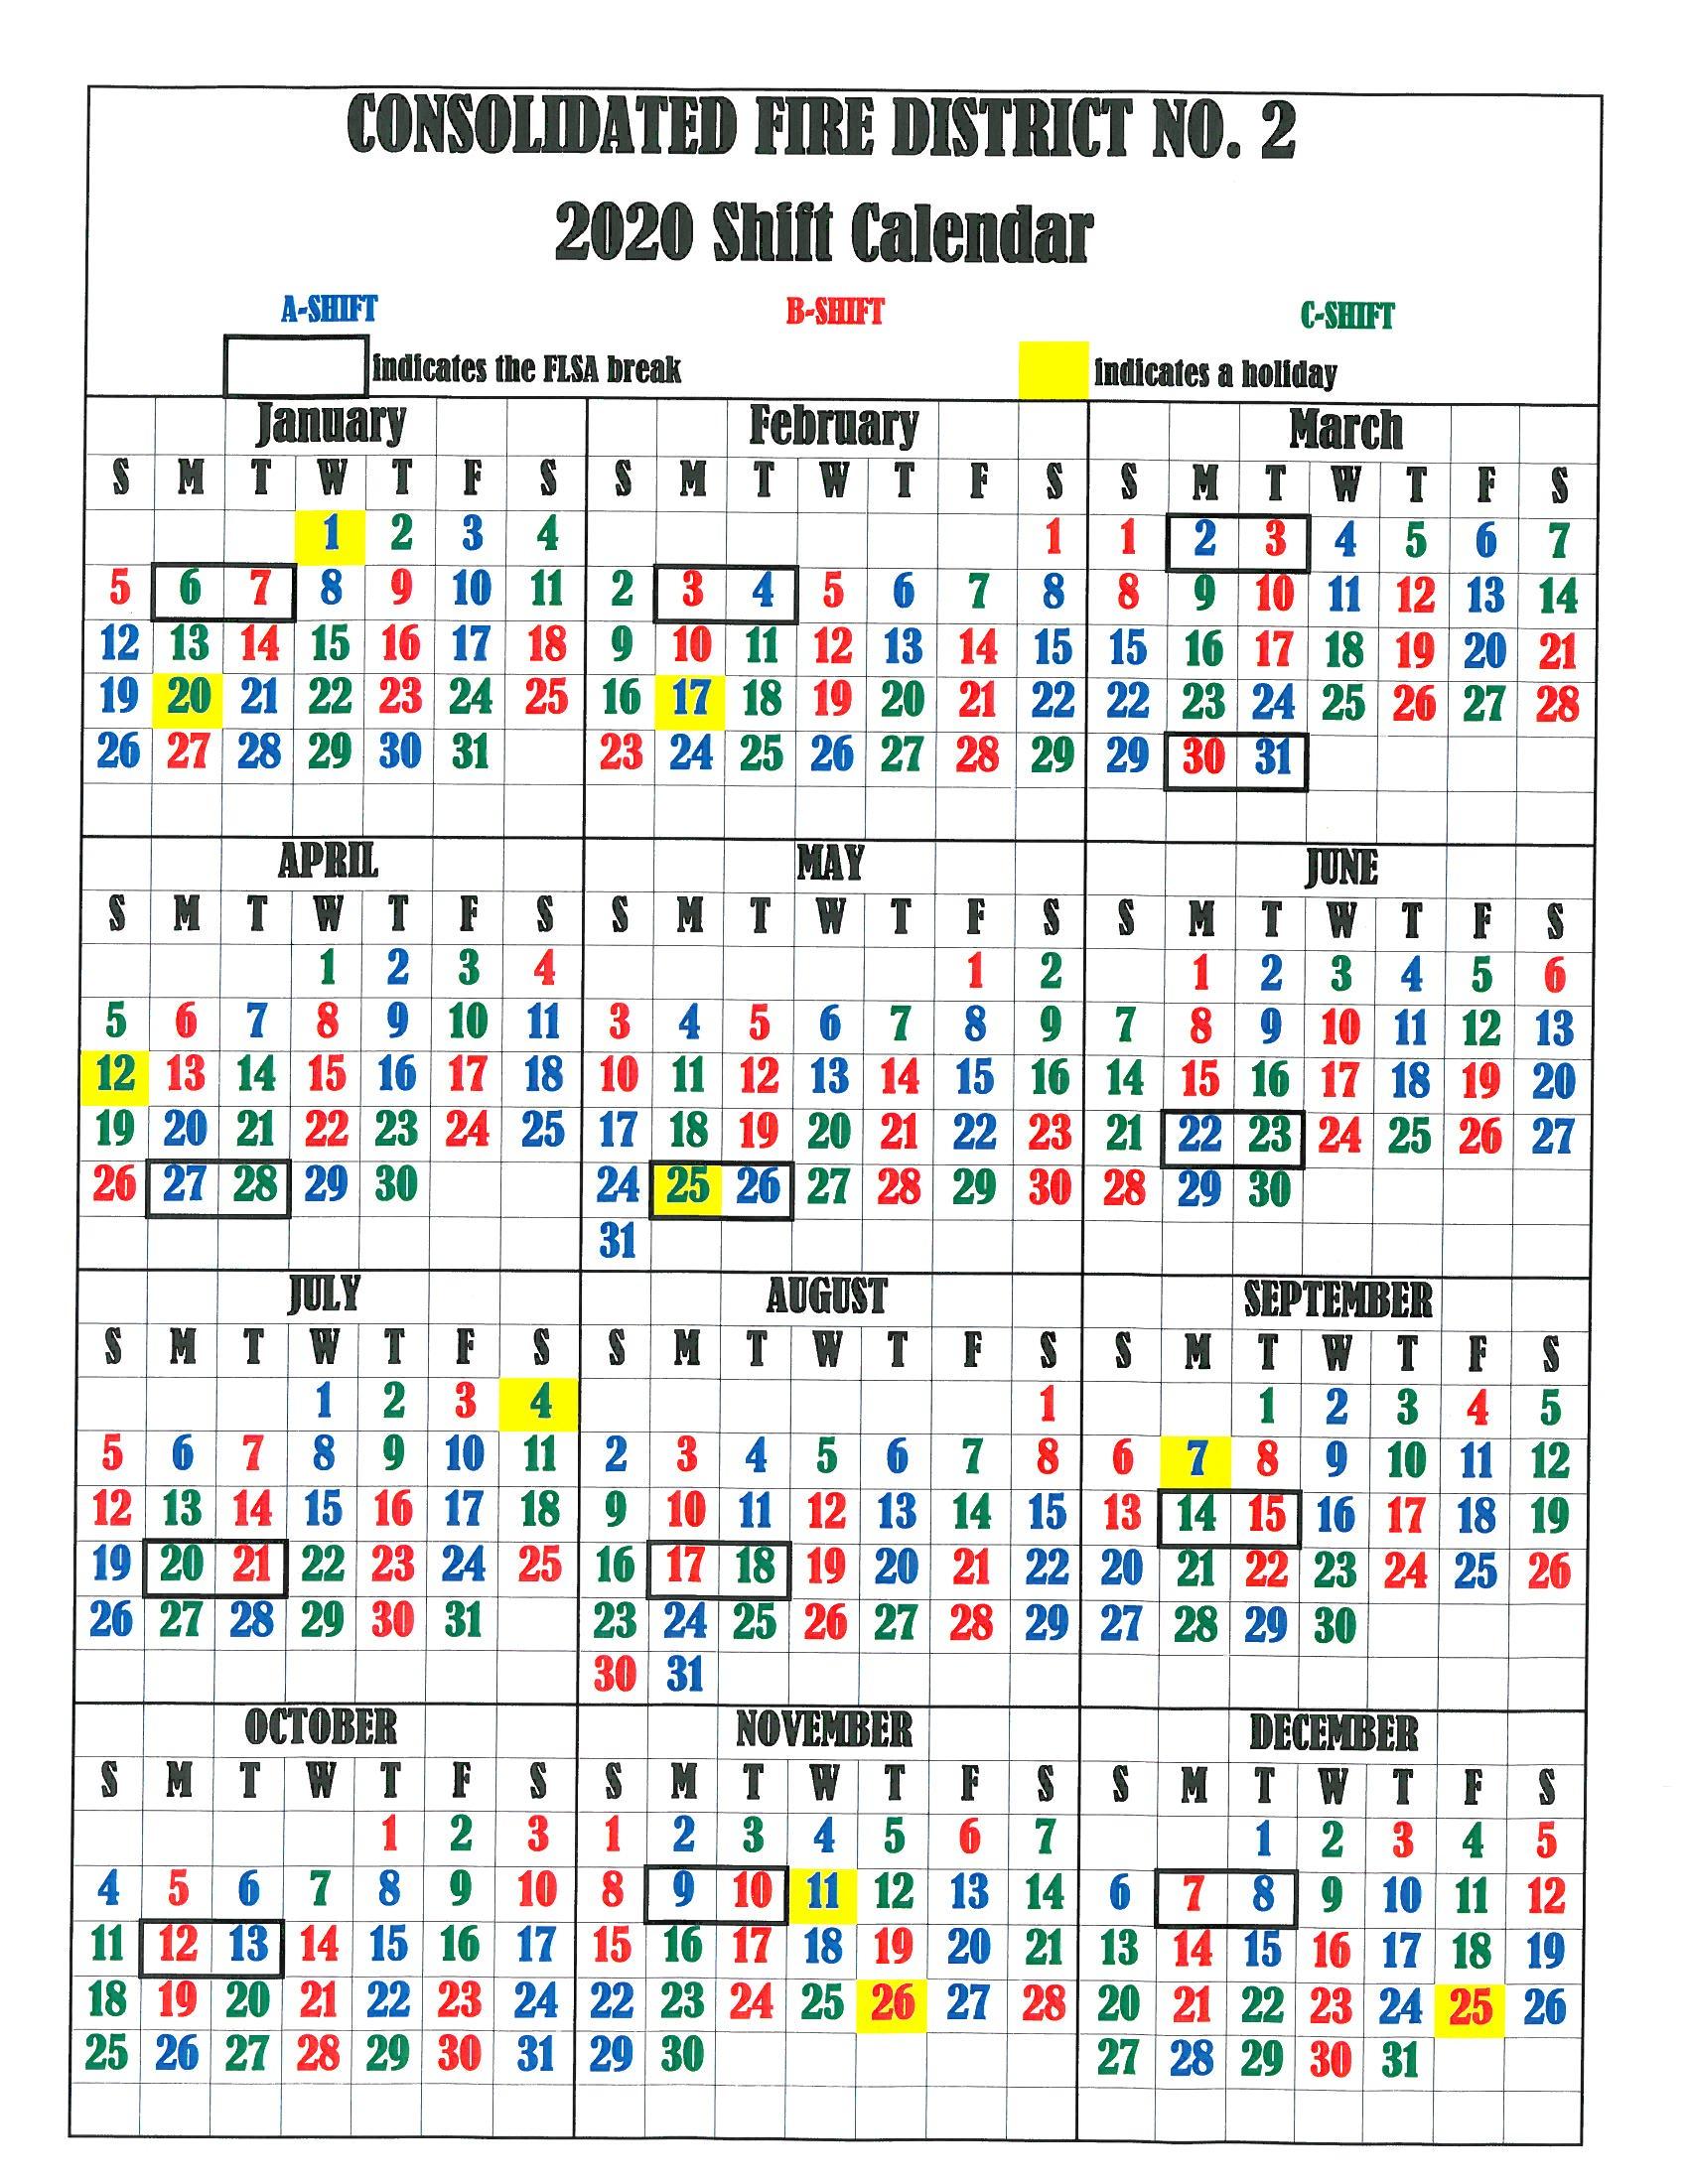 Firefighter Shift Calendar 2020 Printable   Example